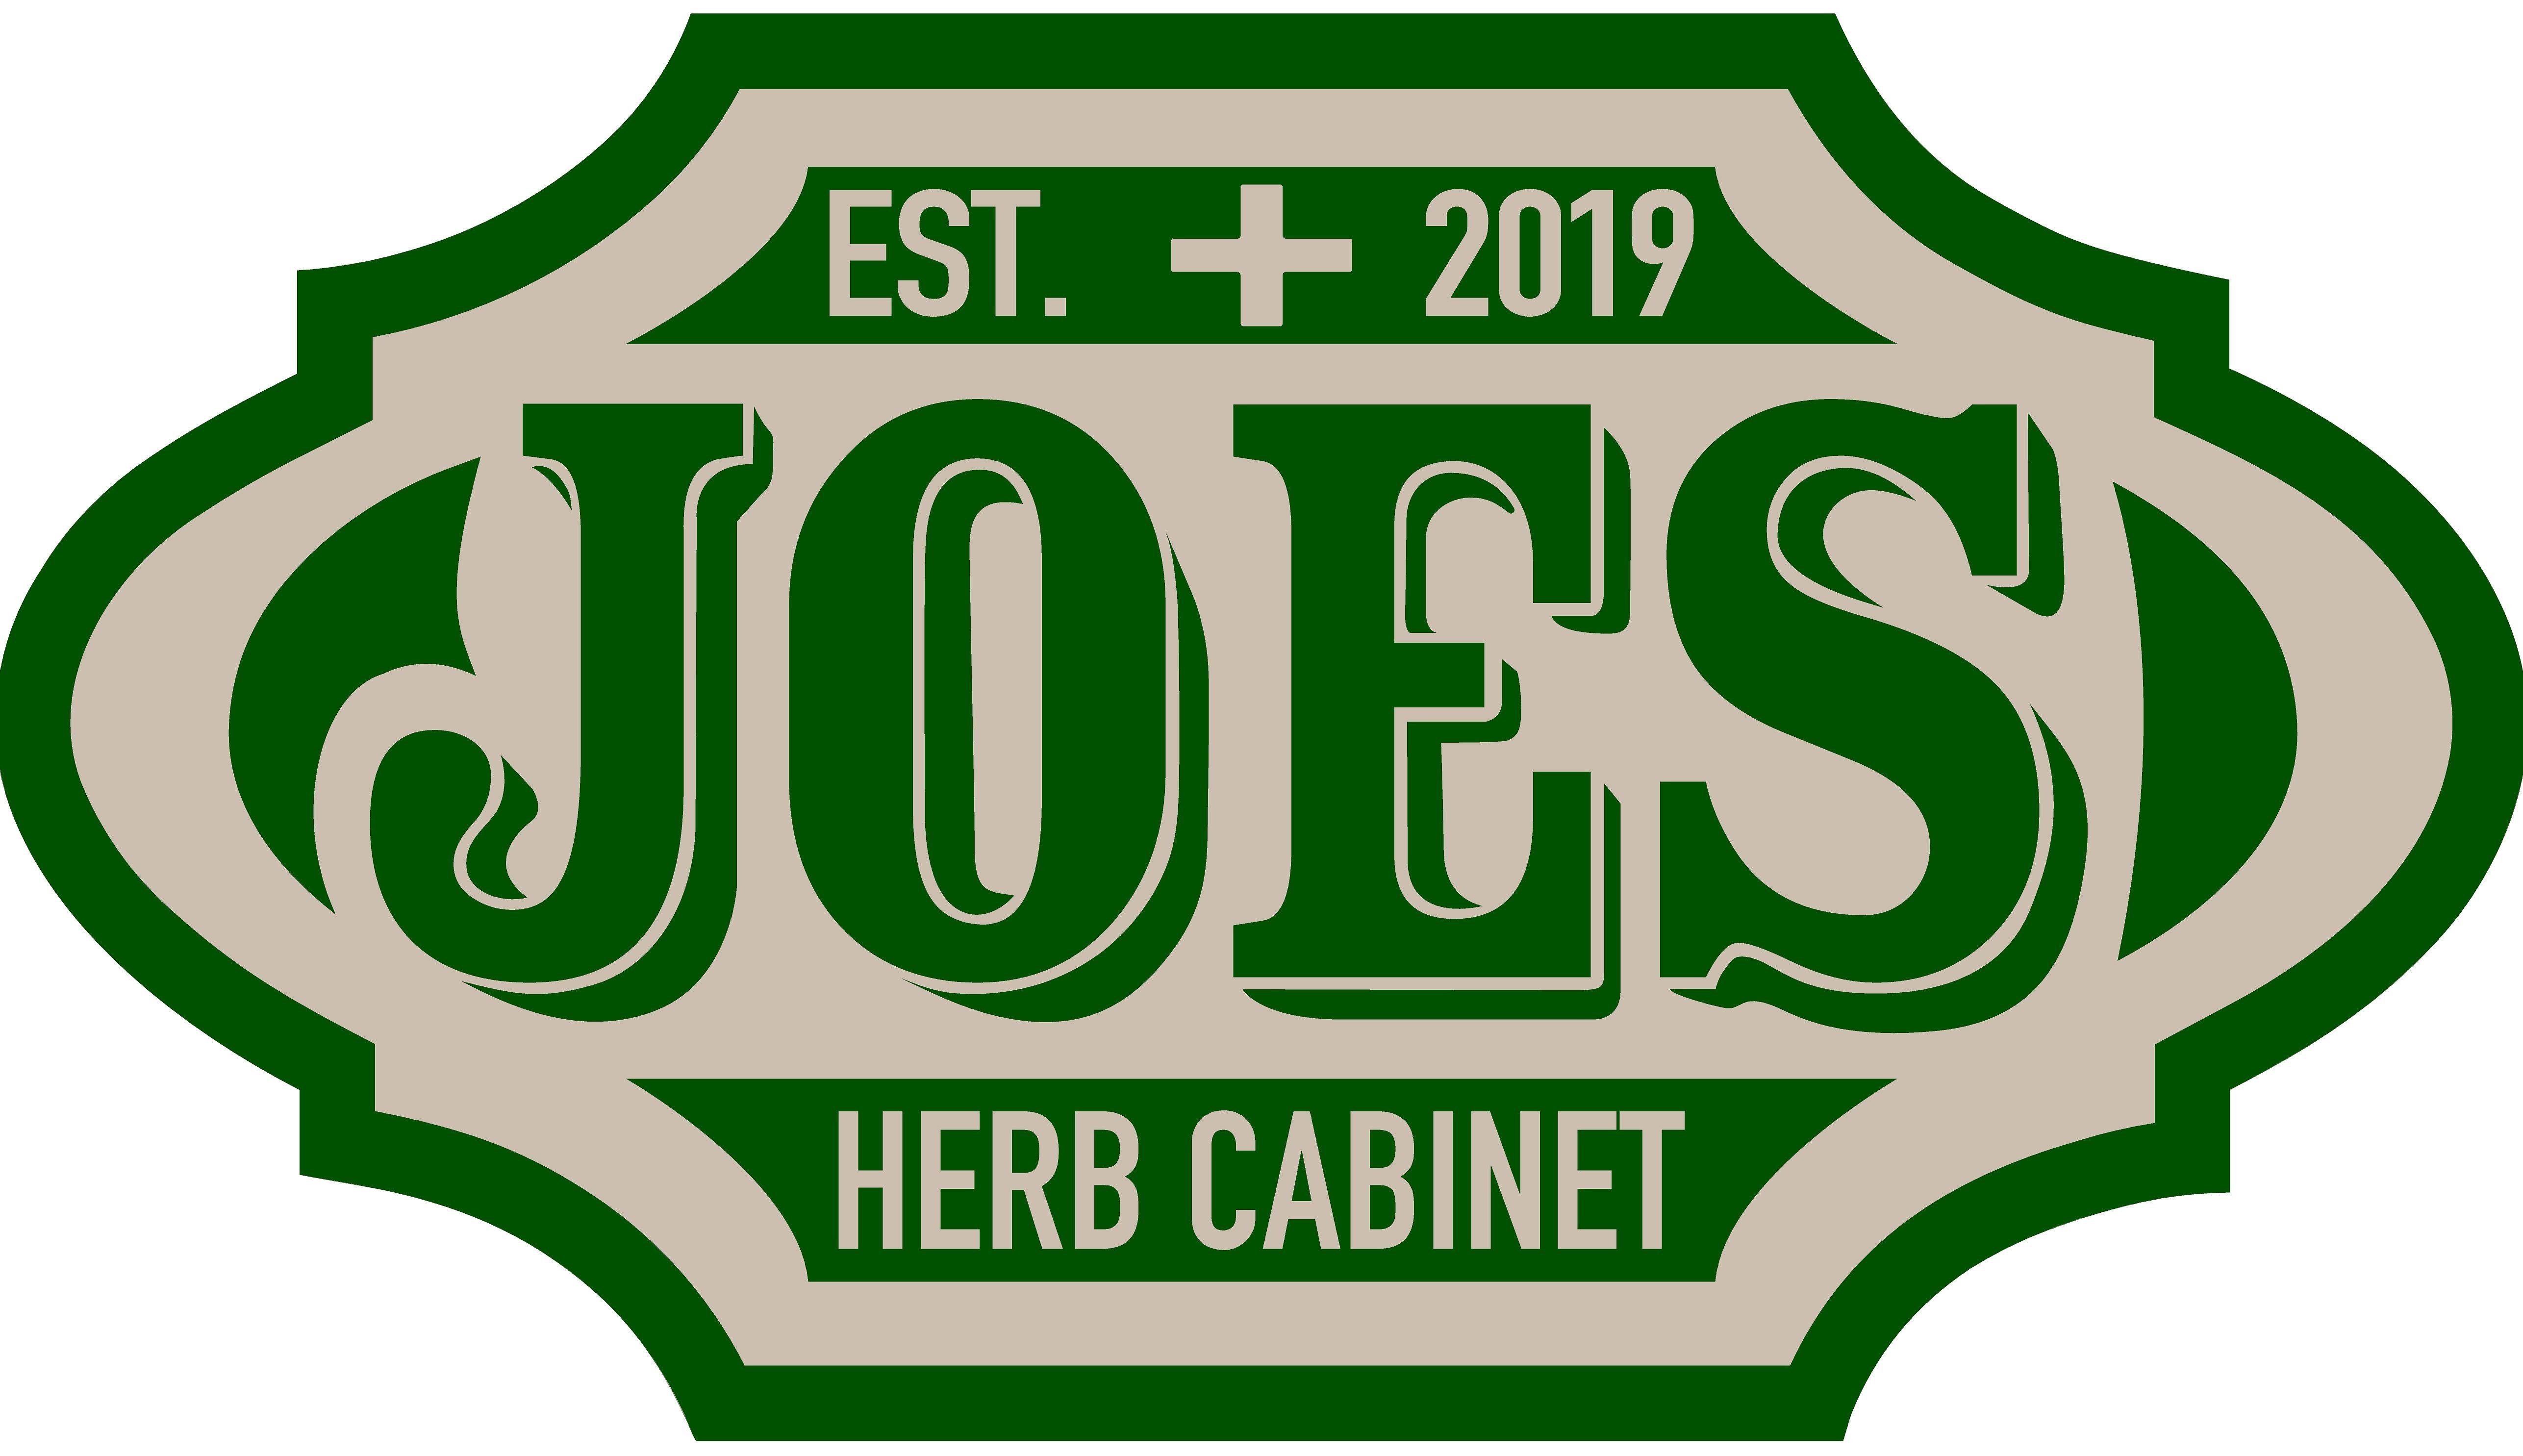 Joe's Herb Cabinet